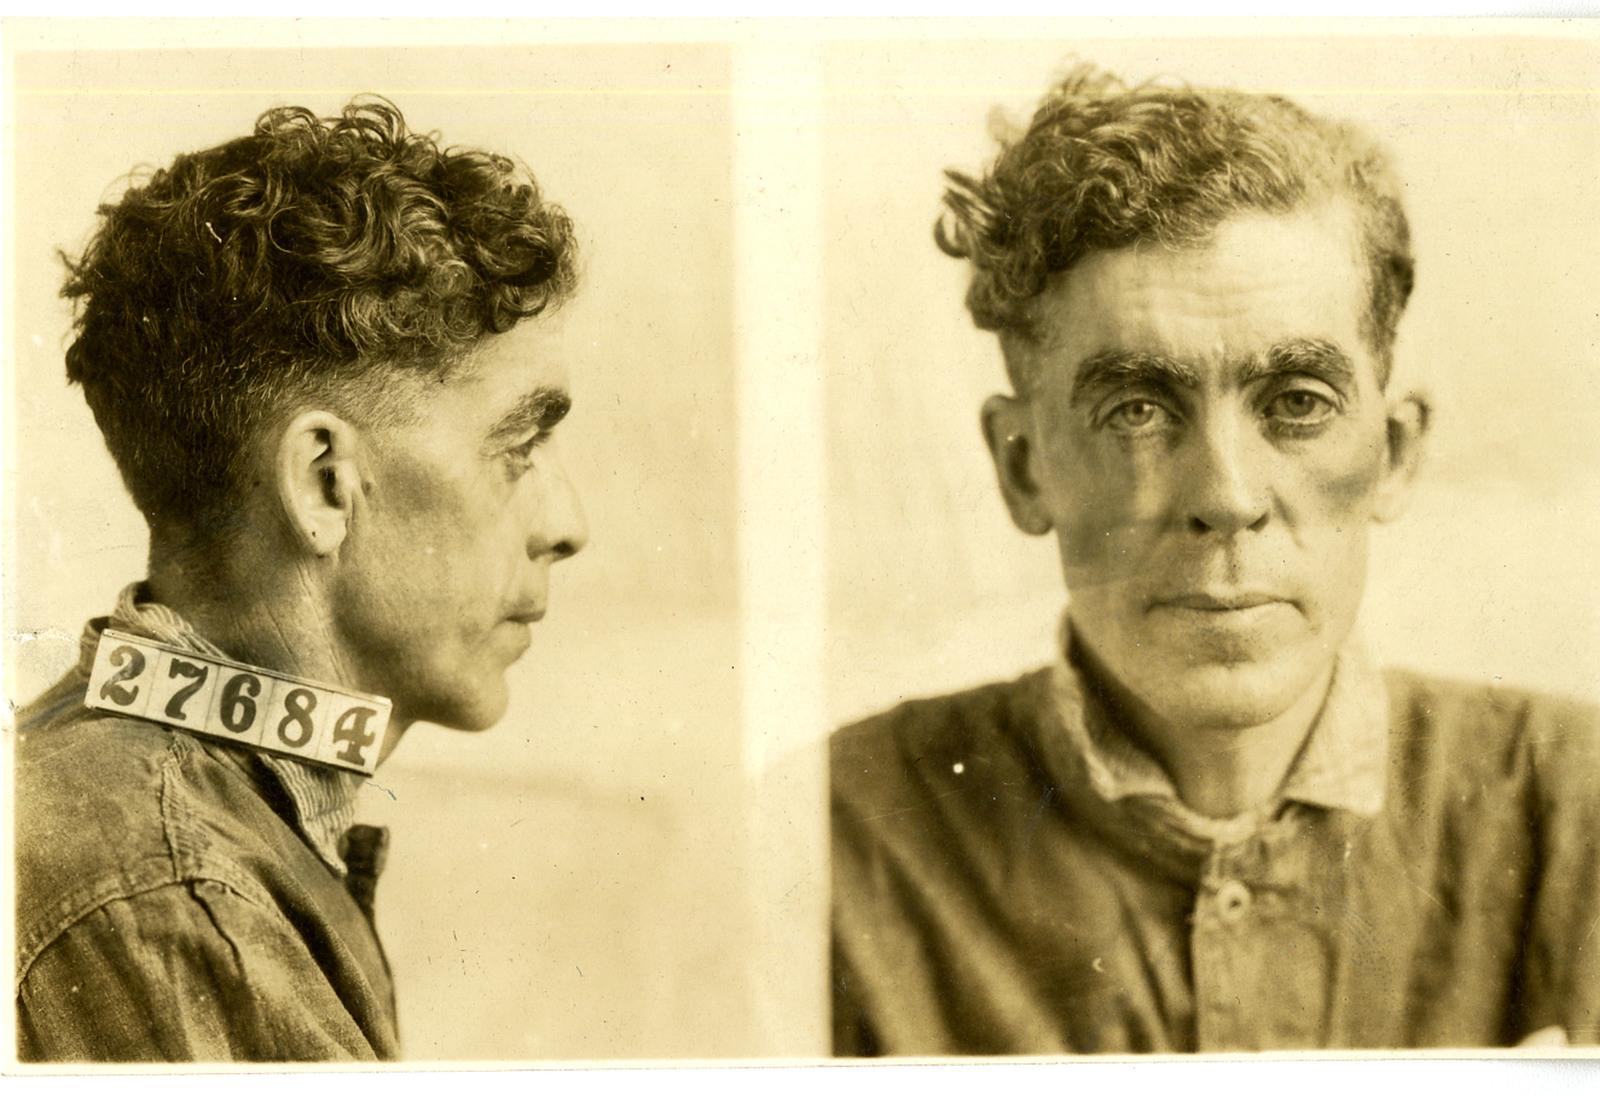 Photograph of Charles Larkin